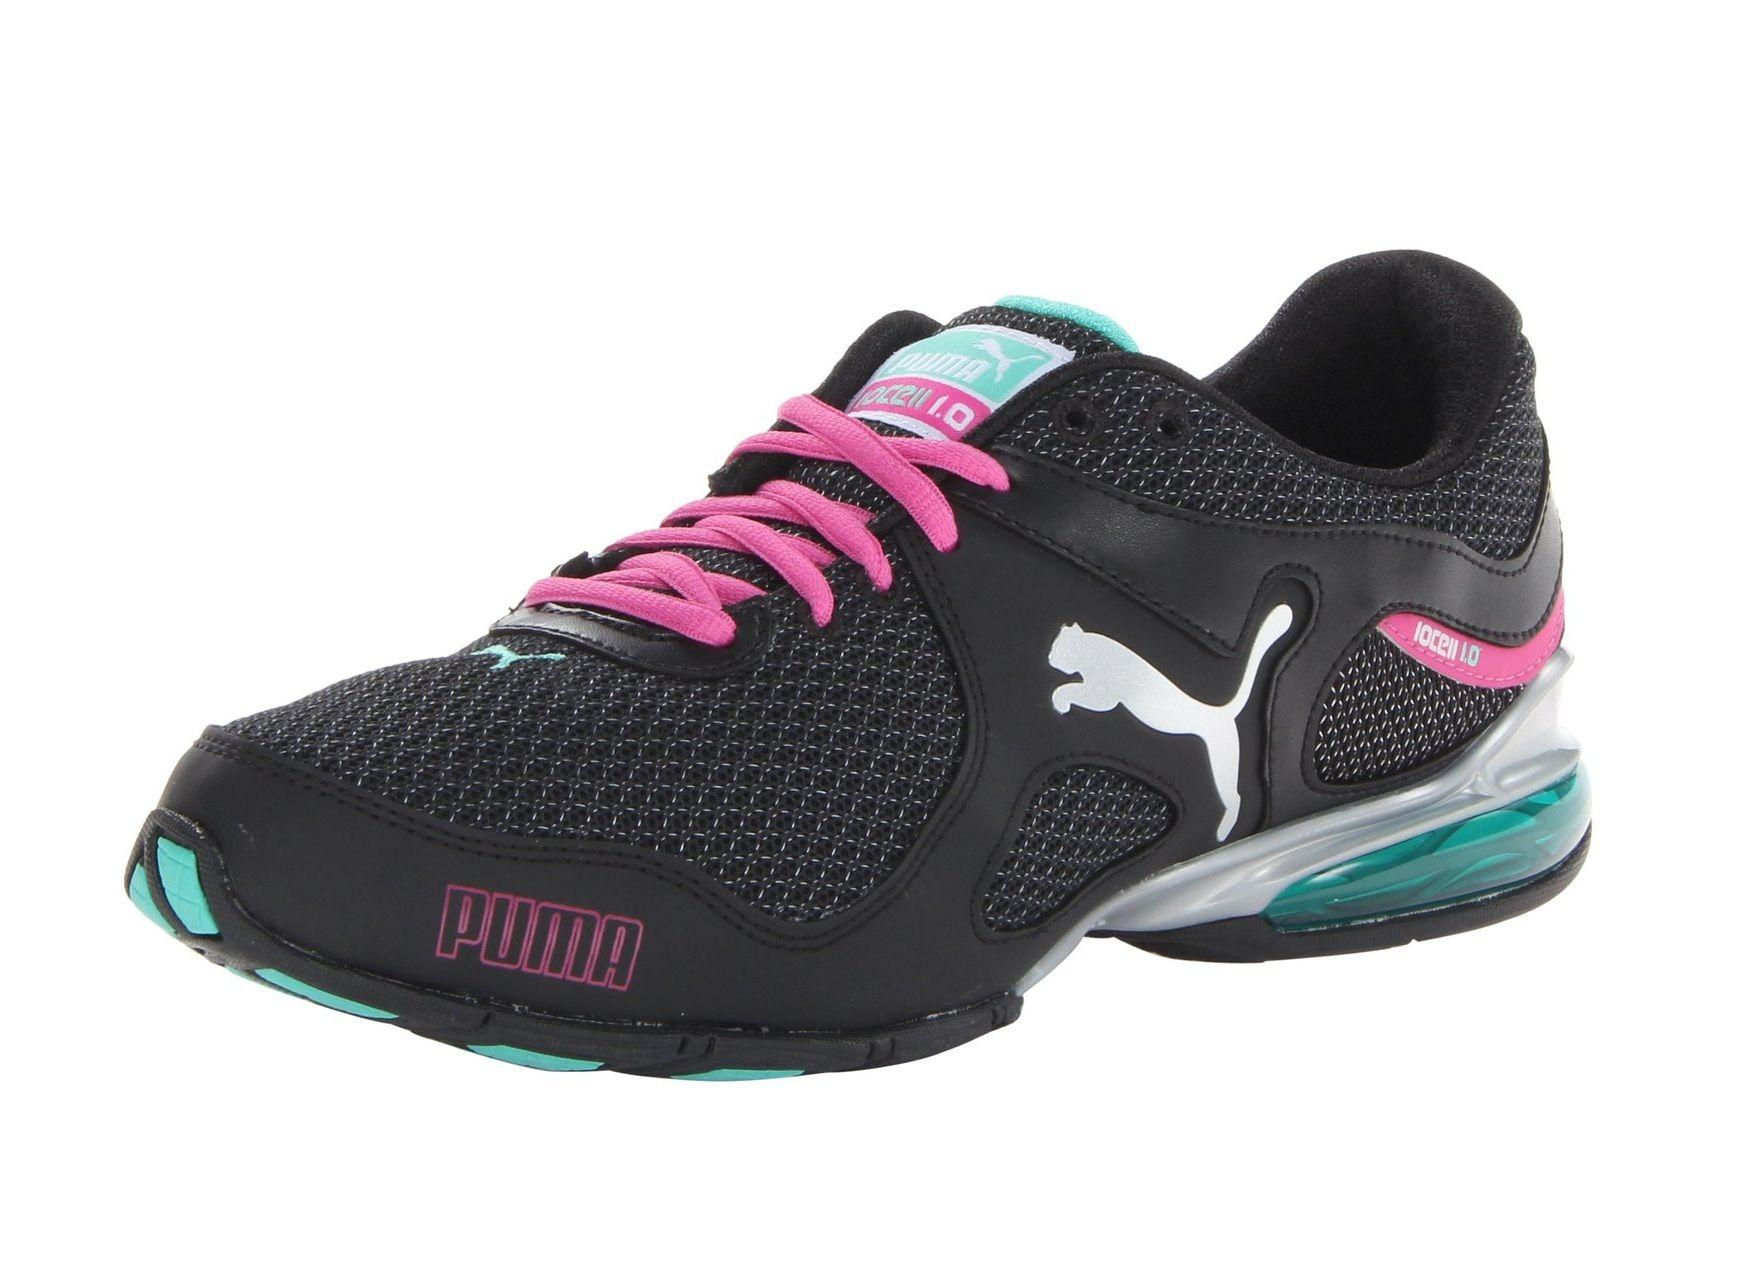 PUMA Women s Cell Riaze Cross-Training Shoe  1cd29e6c2